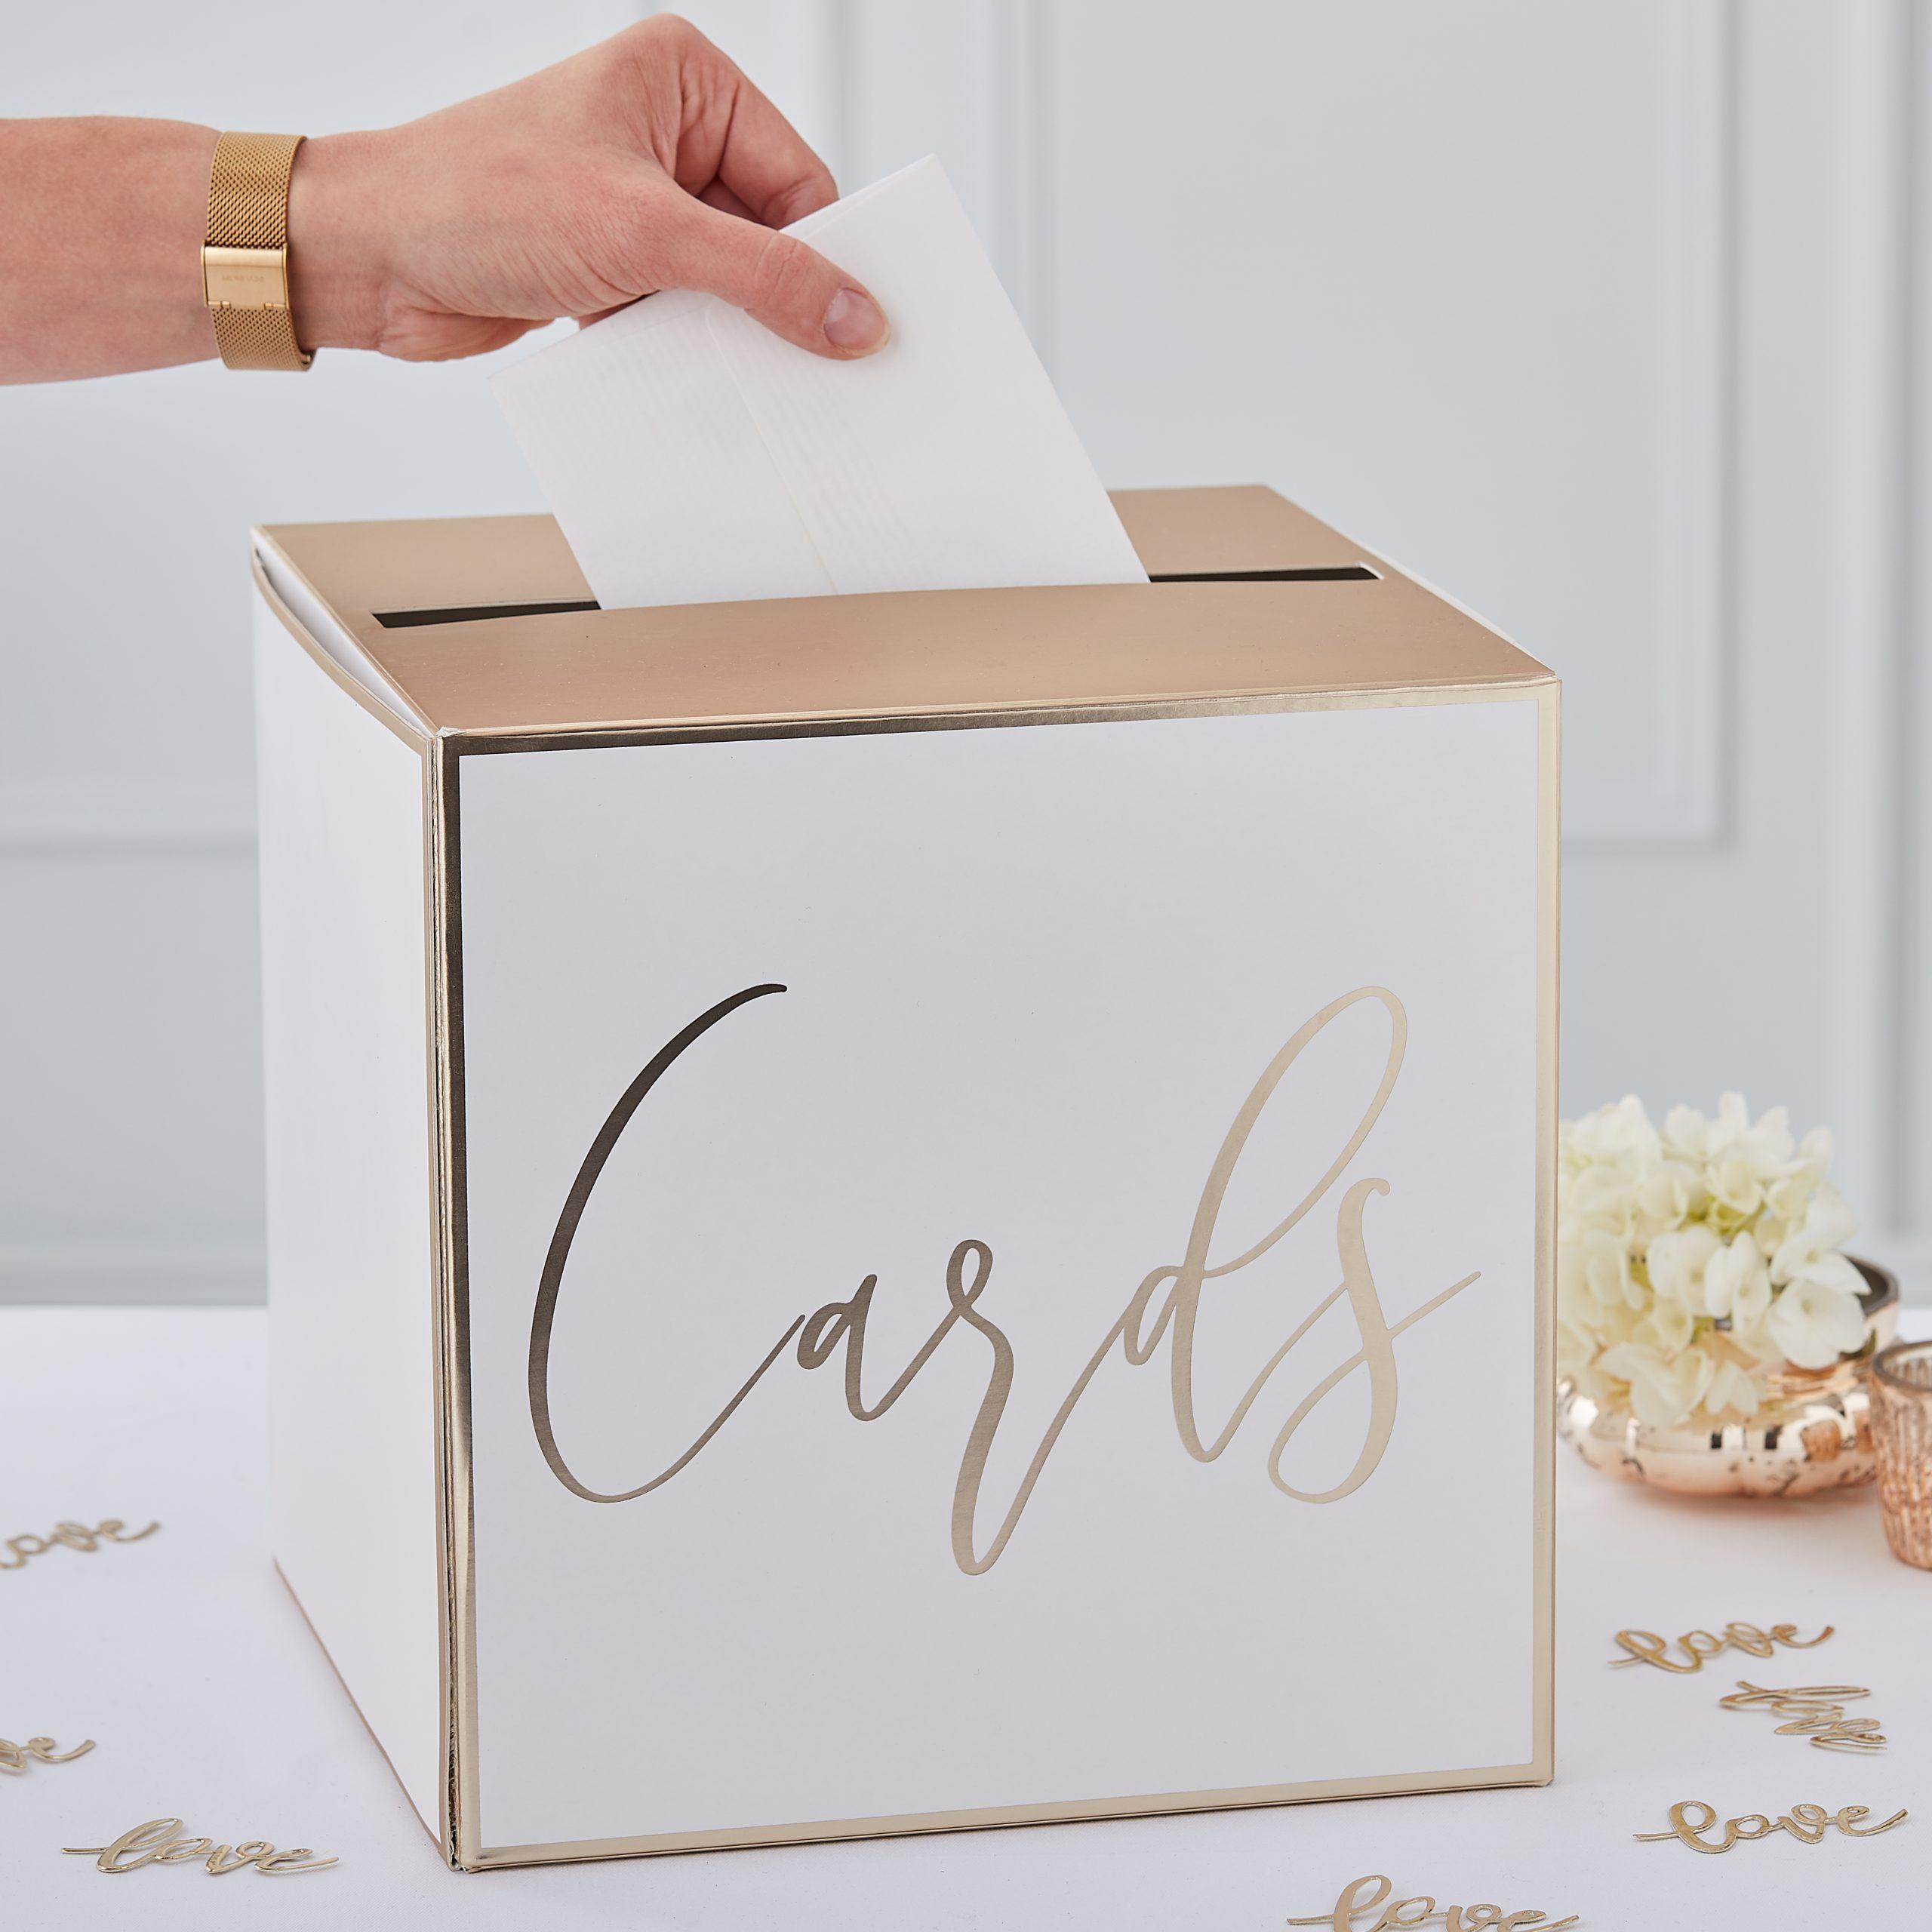 Enveloppendoos bruiloft cards goud ideefabriek karton